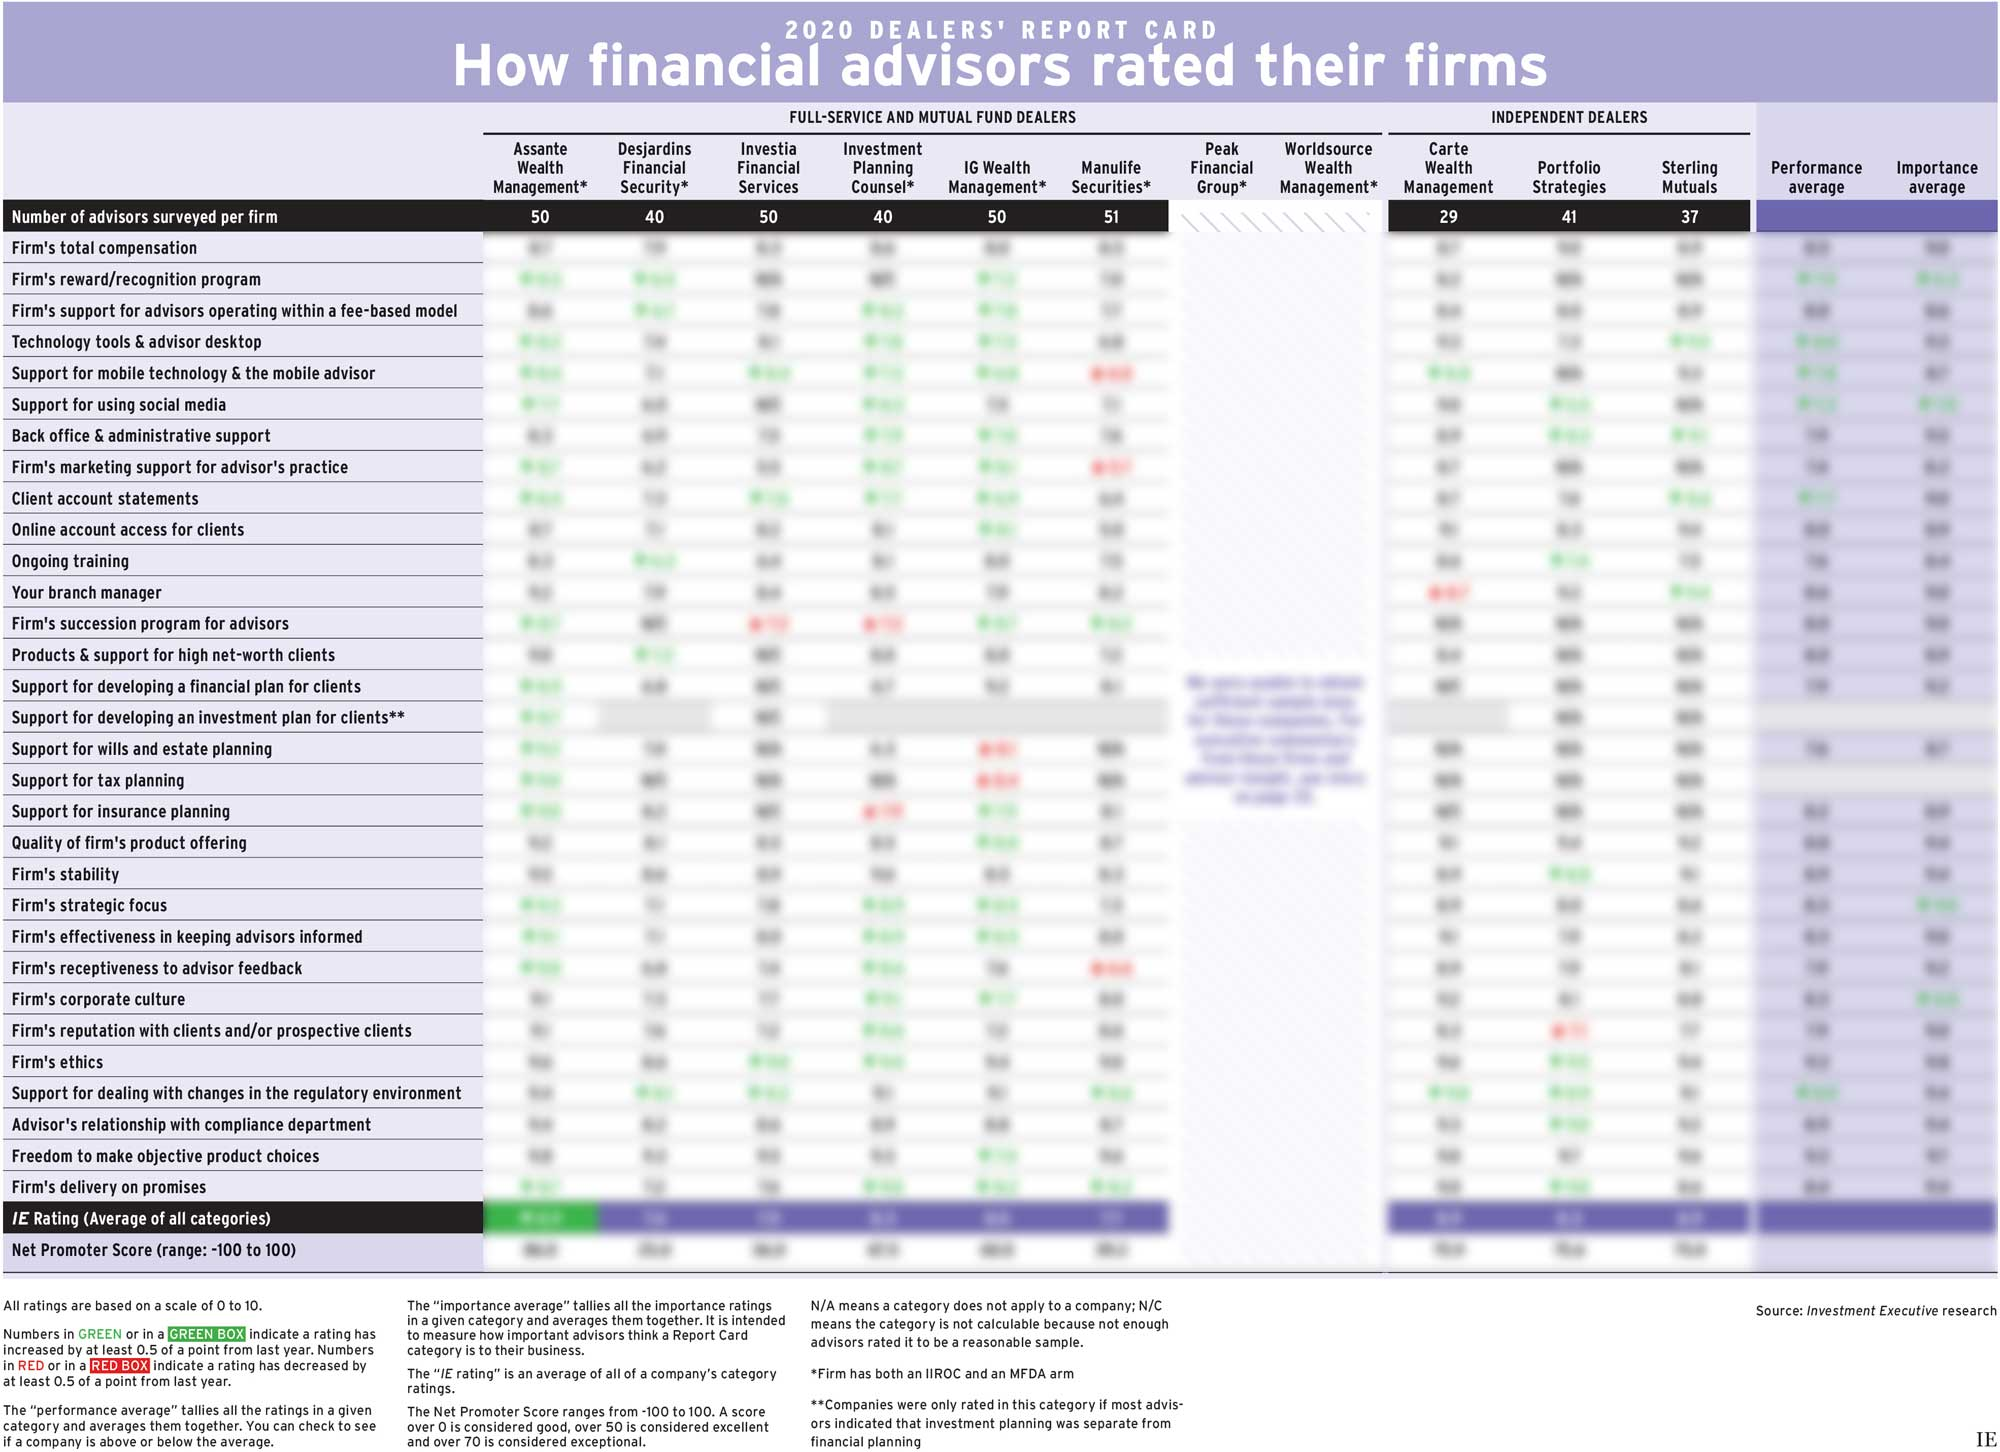 Dealers' Report Card 2020 main chart blurred